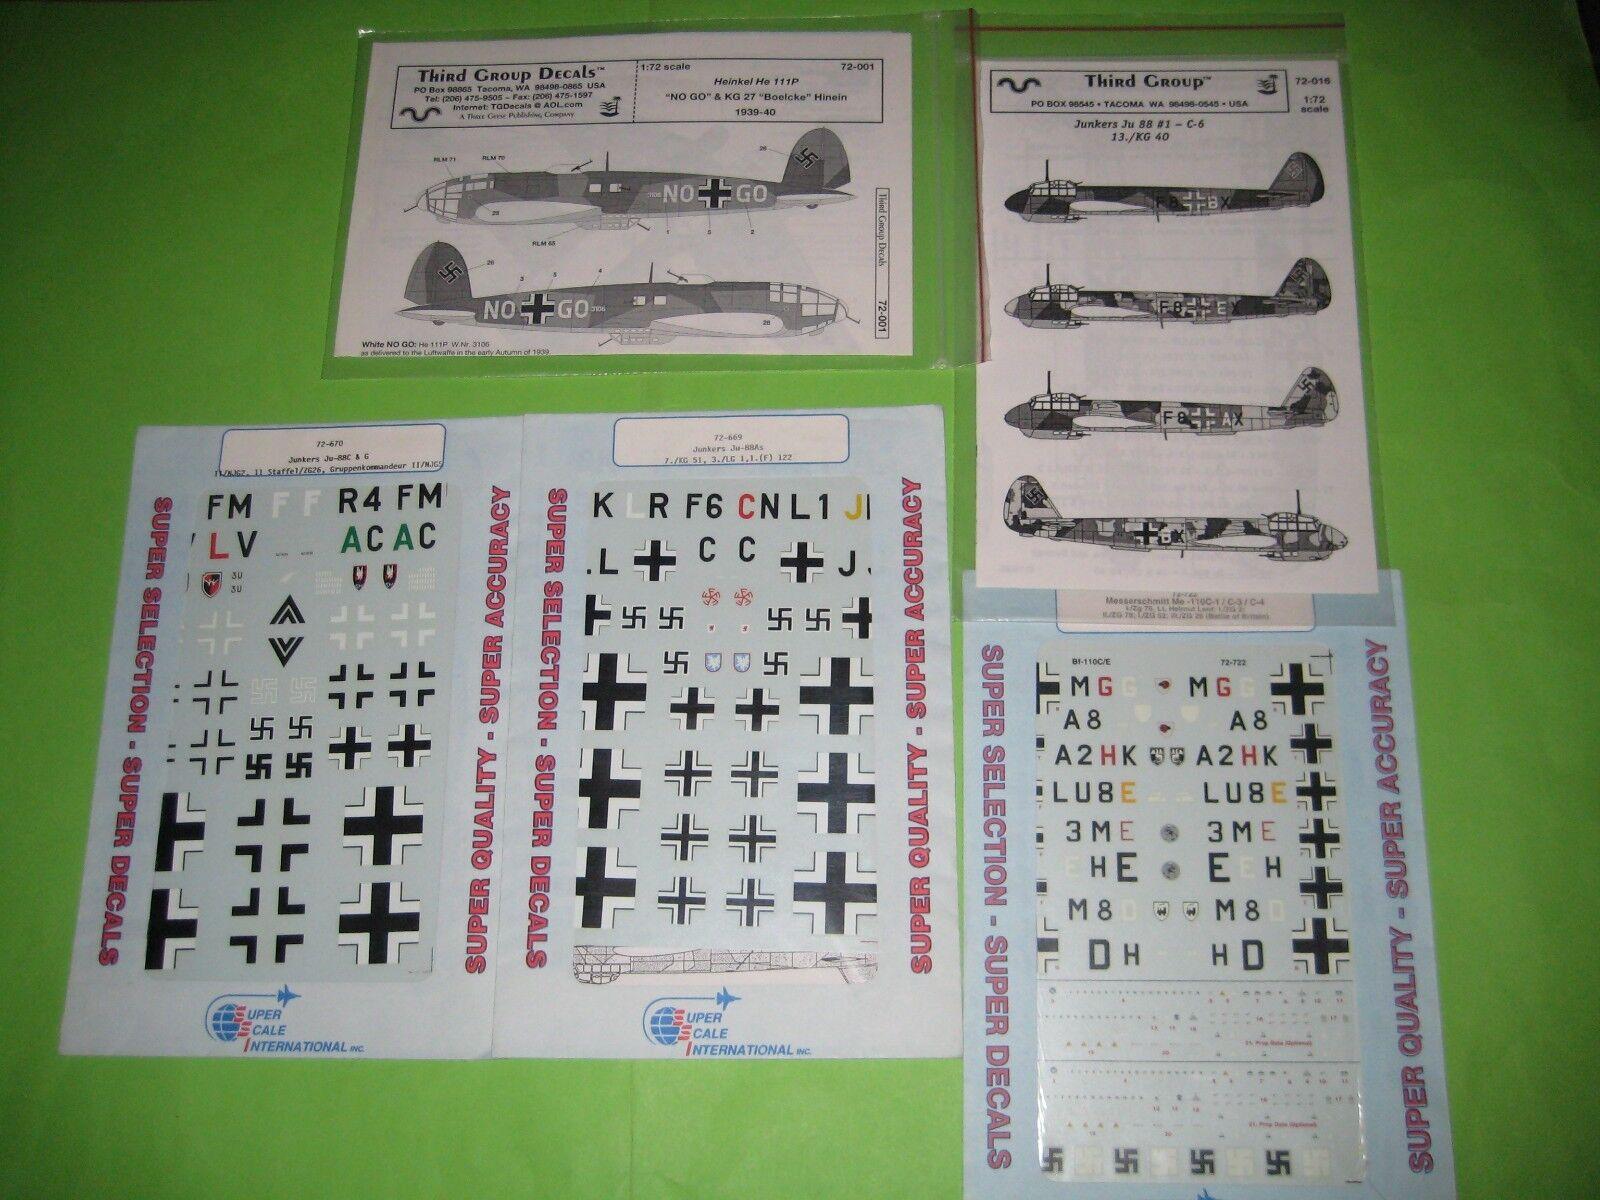 LUFTWAFFE BOMBERS WW II DECALS SET 1 72 SCALE - SUPER KOMBO SET